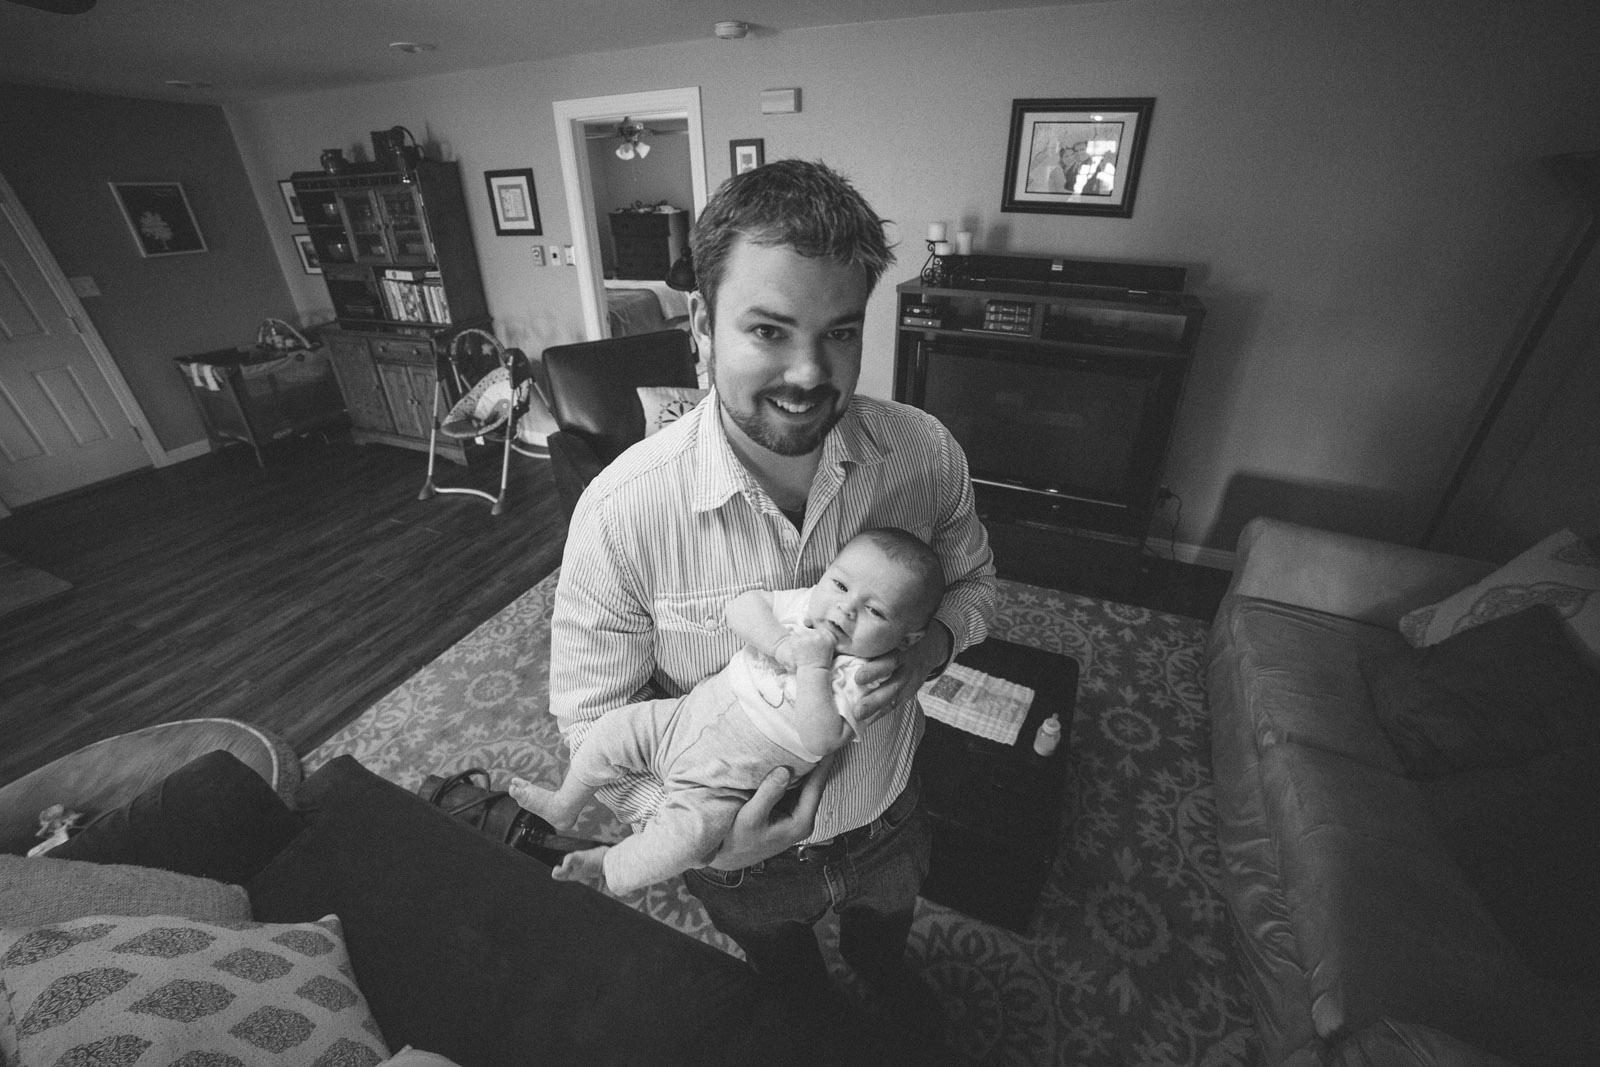 051-newborn-baby-fatherhood-birds-bed-cuddling-new-mexico-farmington